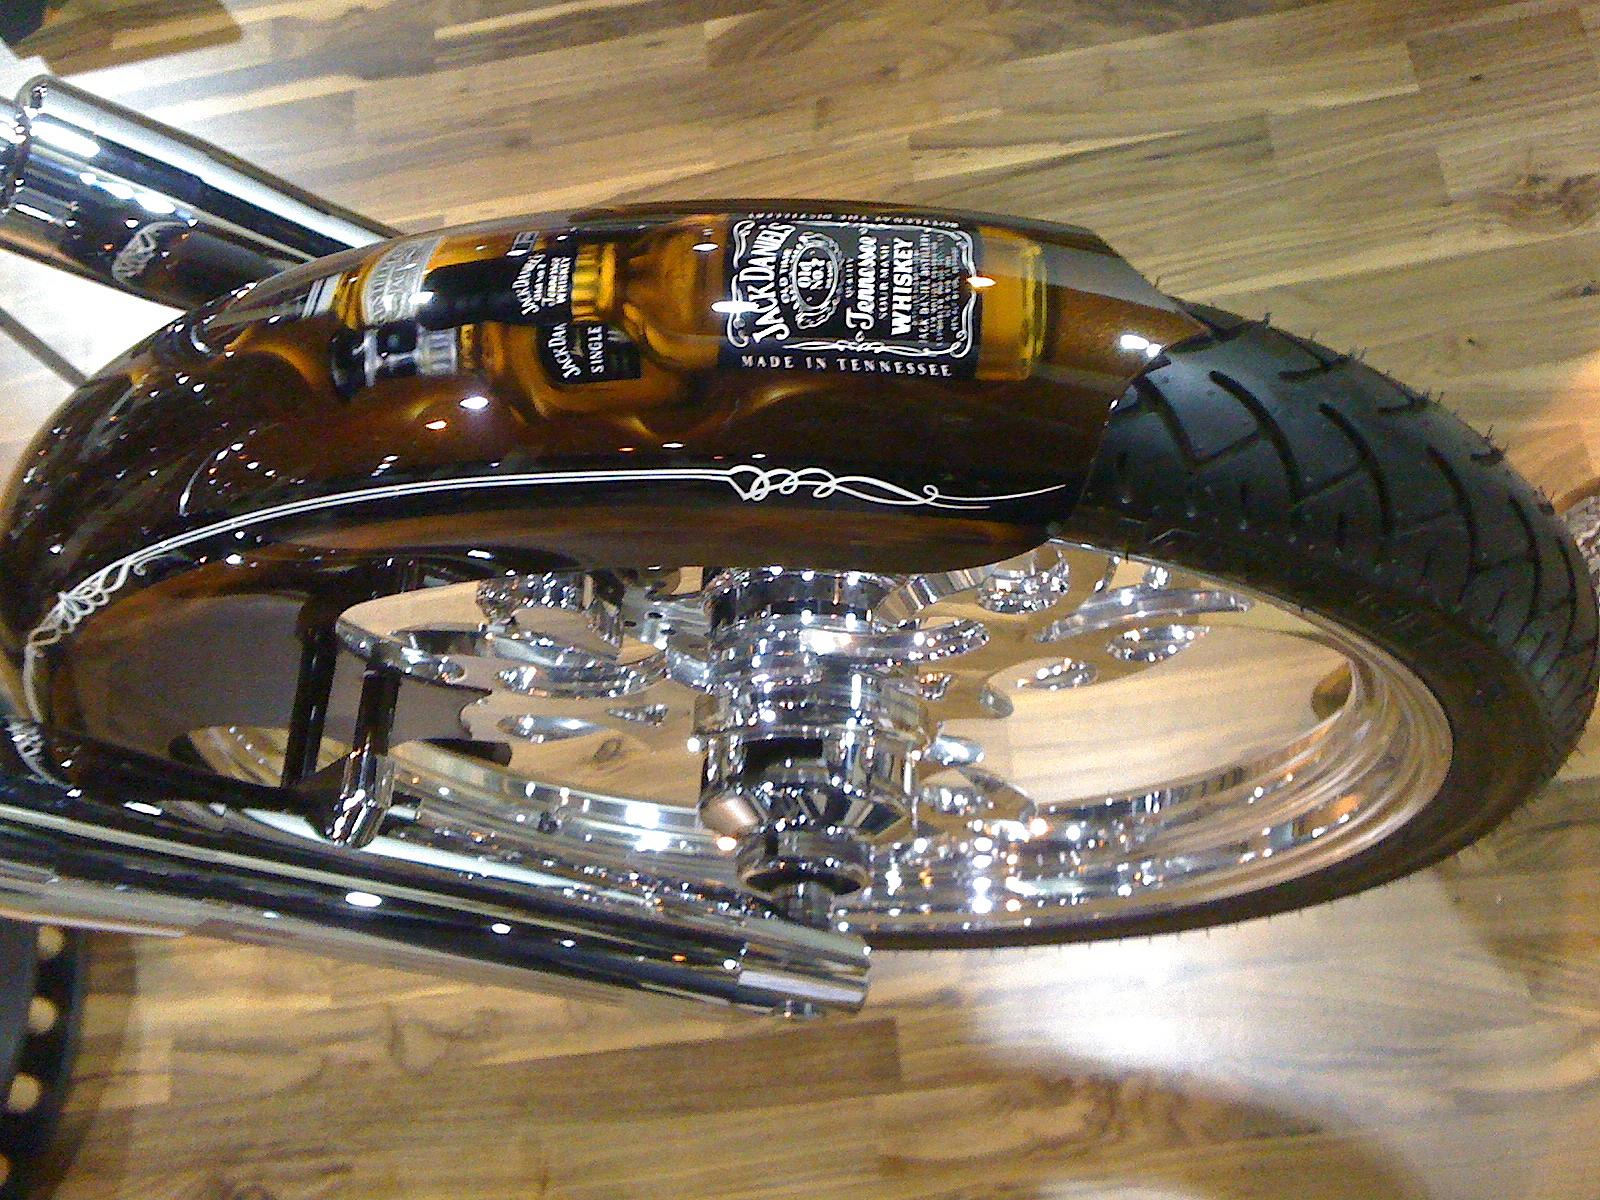 Jack Daniel's Custom Motorcycles 1600 x 1200 · 2195 kB · jpeg